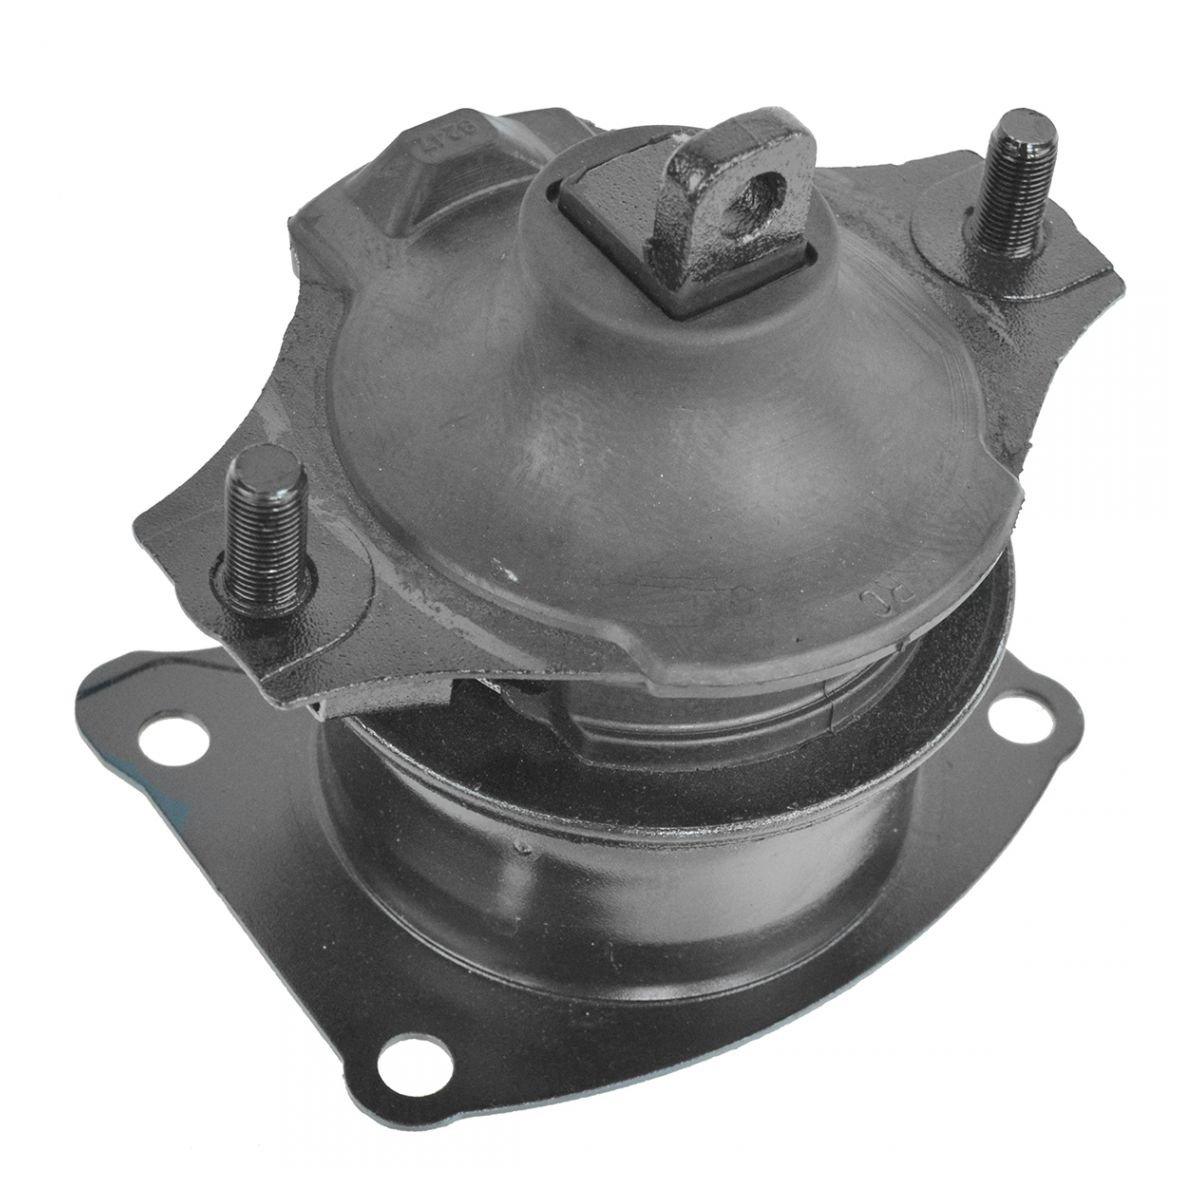 Engine /& Transmission Mount Kit Set of 6 for 03-07 Honda Accord 3.0L AT